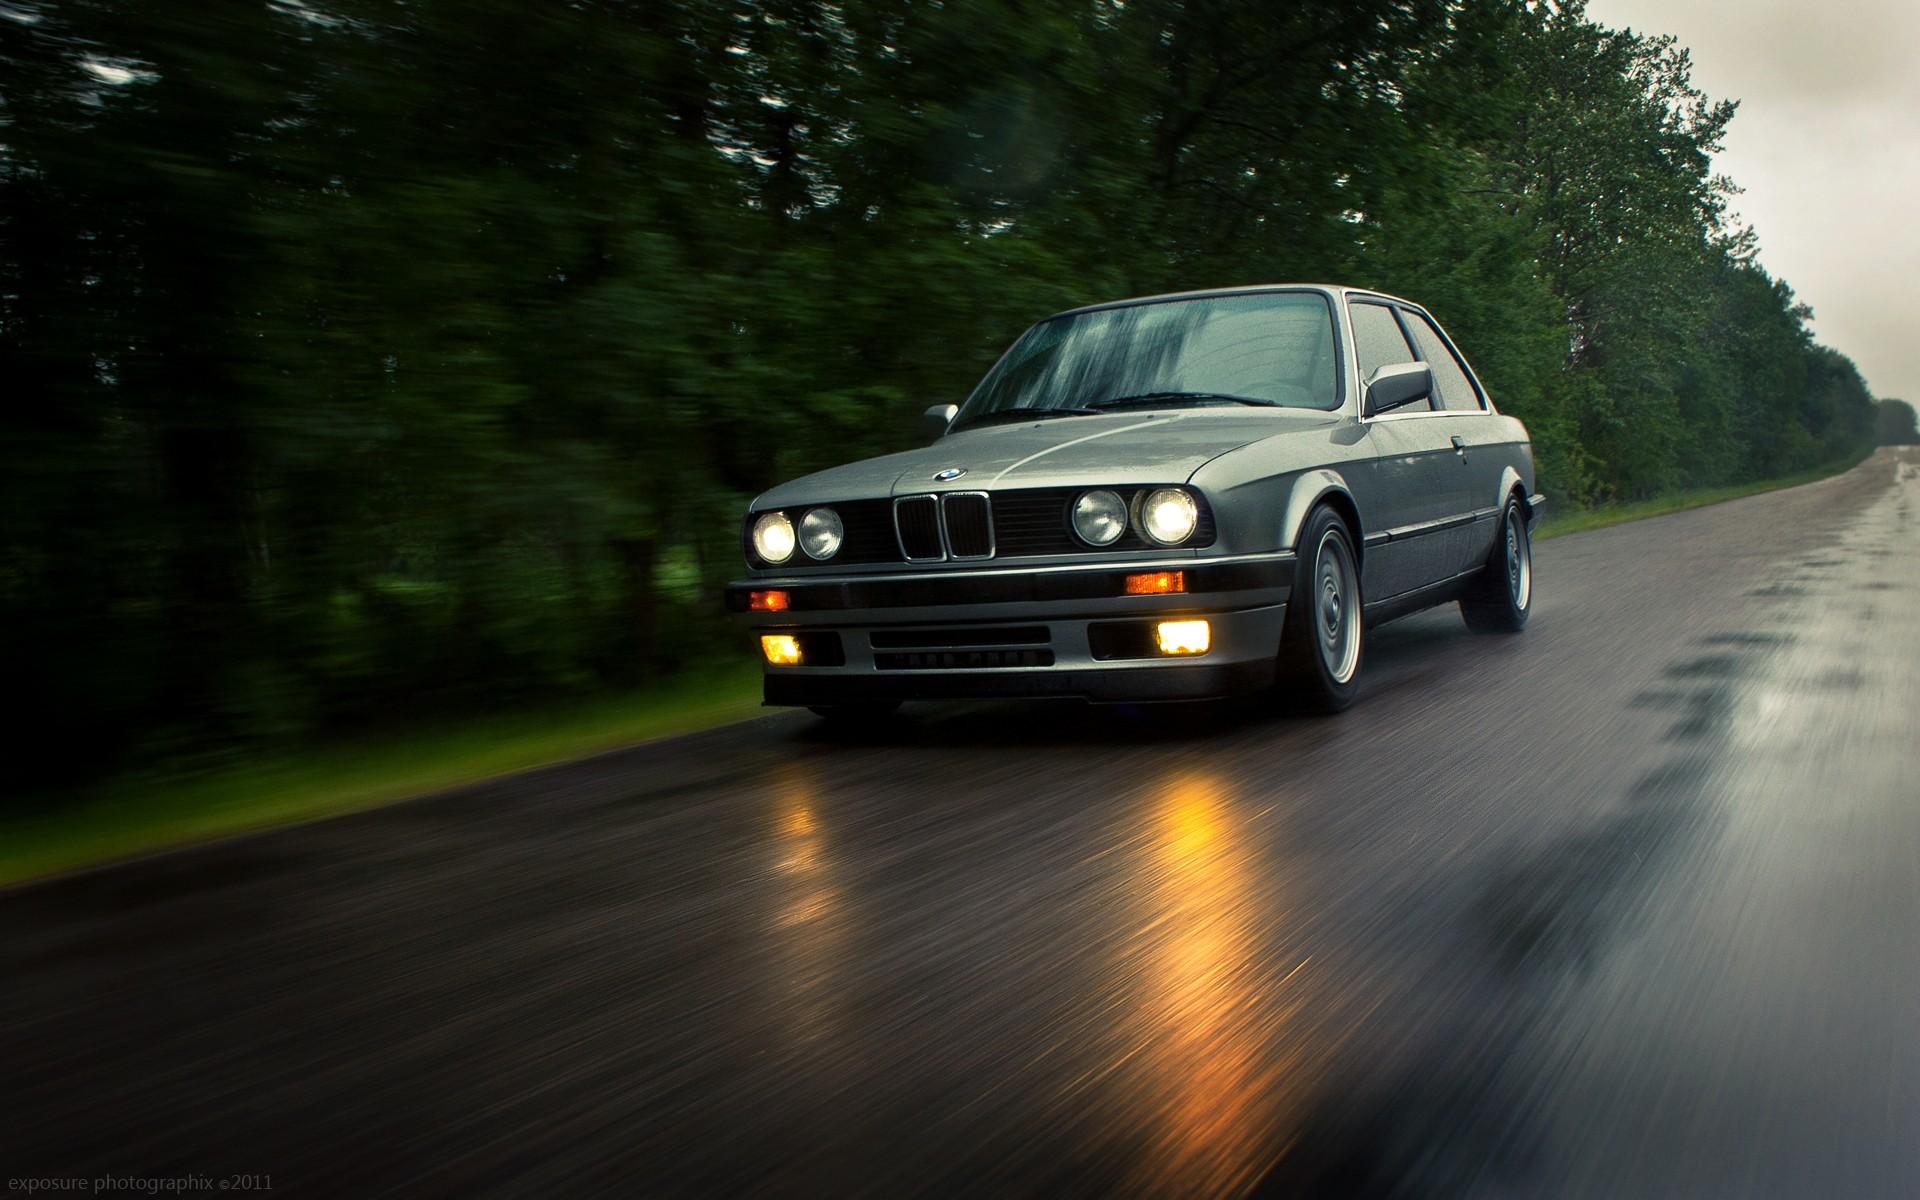 Bmw Hd Wallpapers Background: BMW E30 Wallpaper ·① WallpaperTag